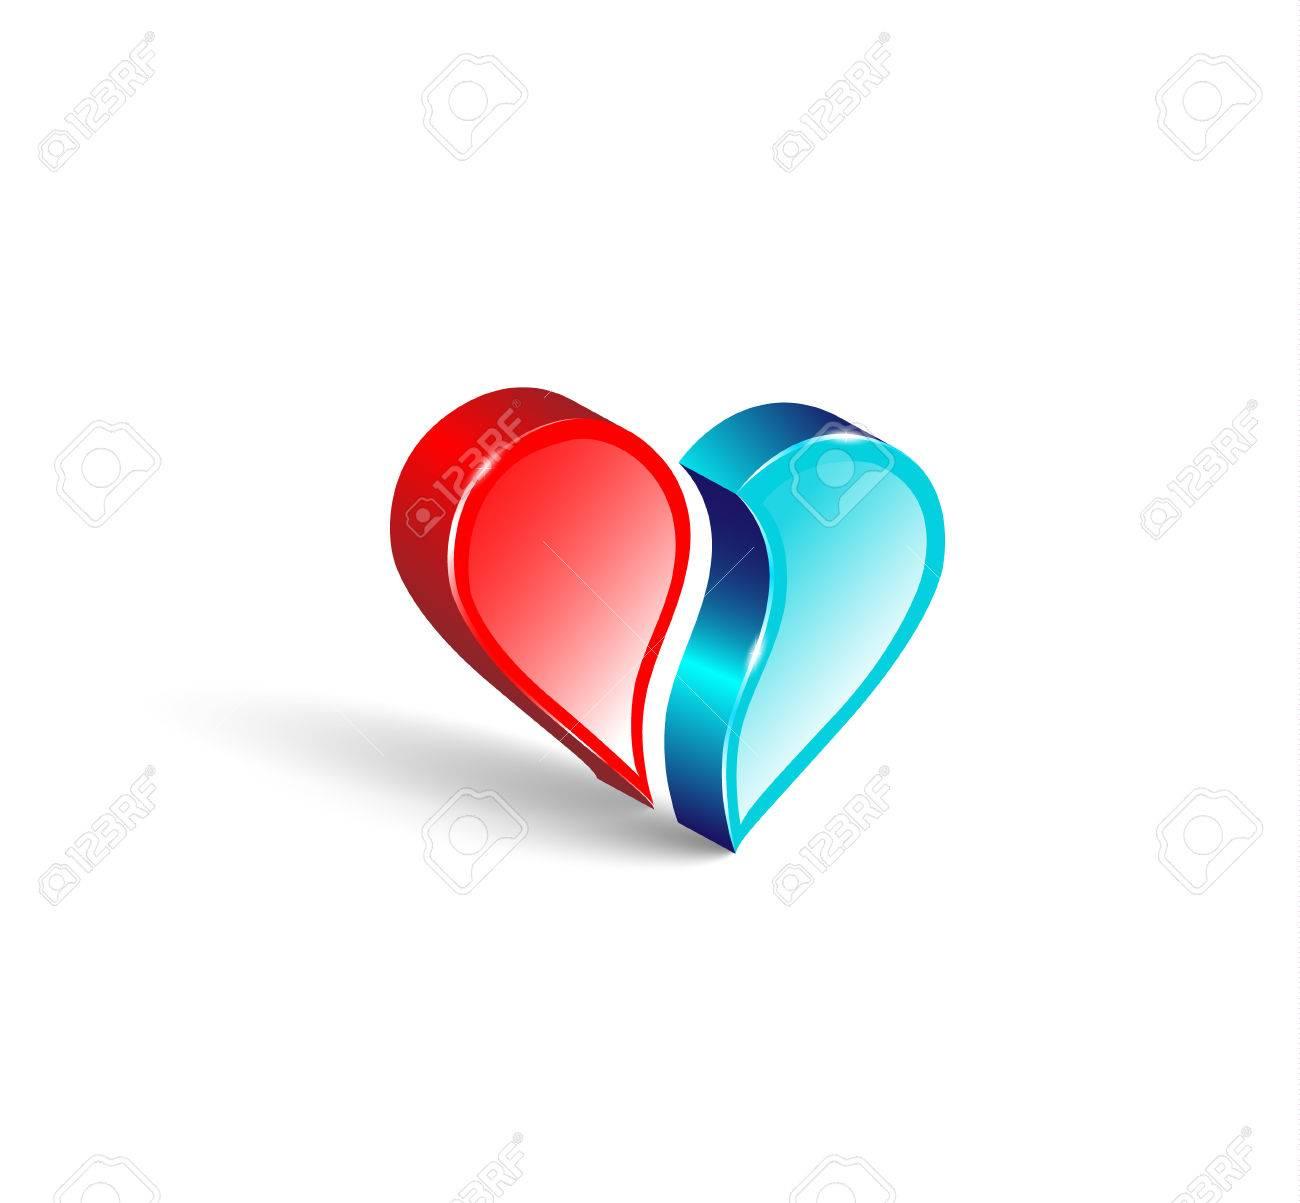 Logo 3d Emblem Two Comparing Parts Of Heart Colorful Design